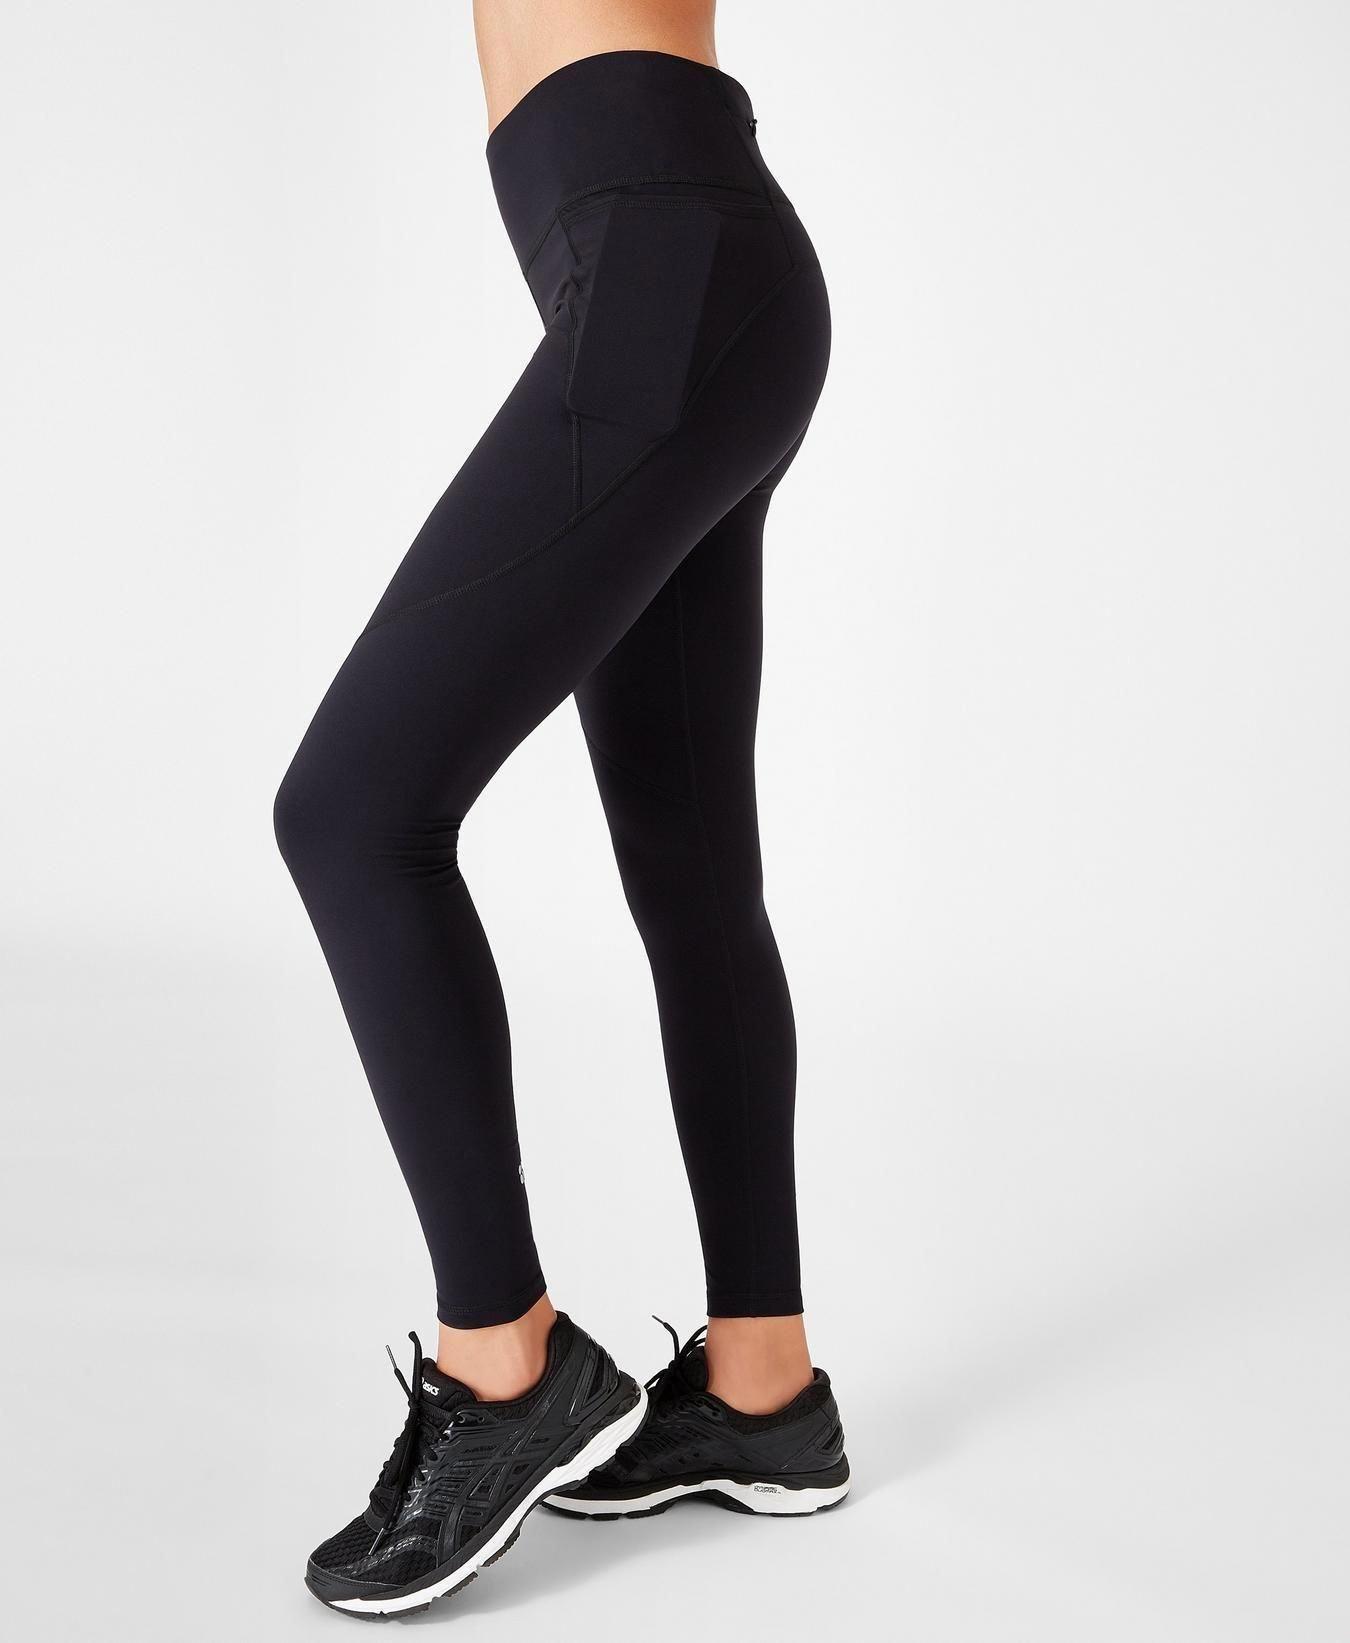 online store leggings leggings in 2020 Black workout